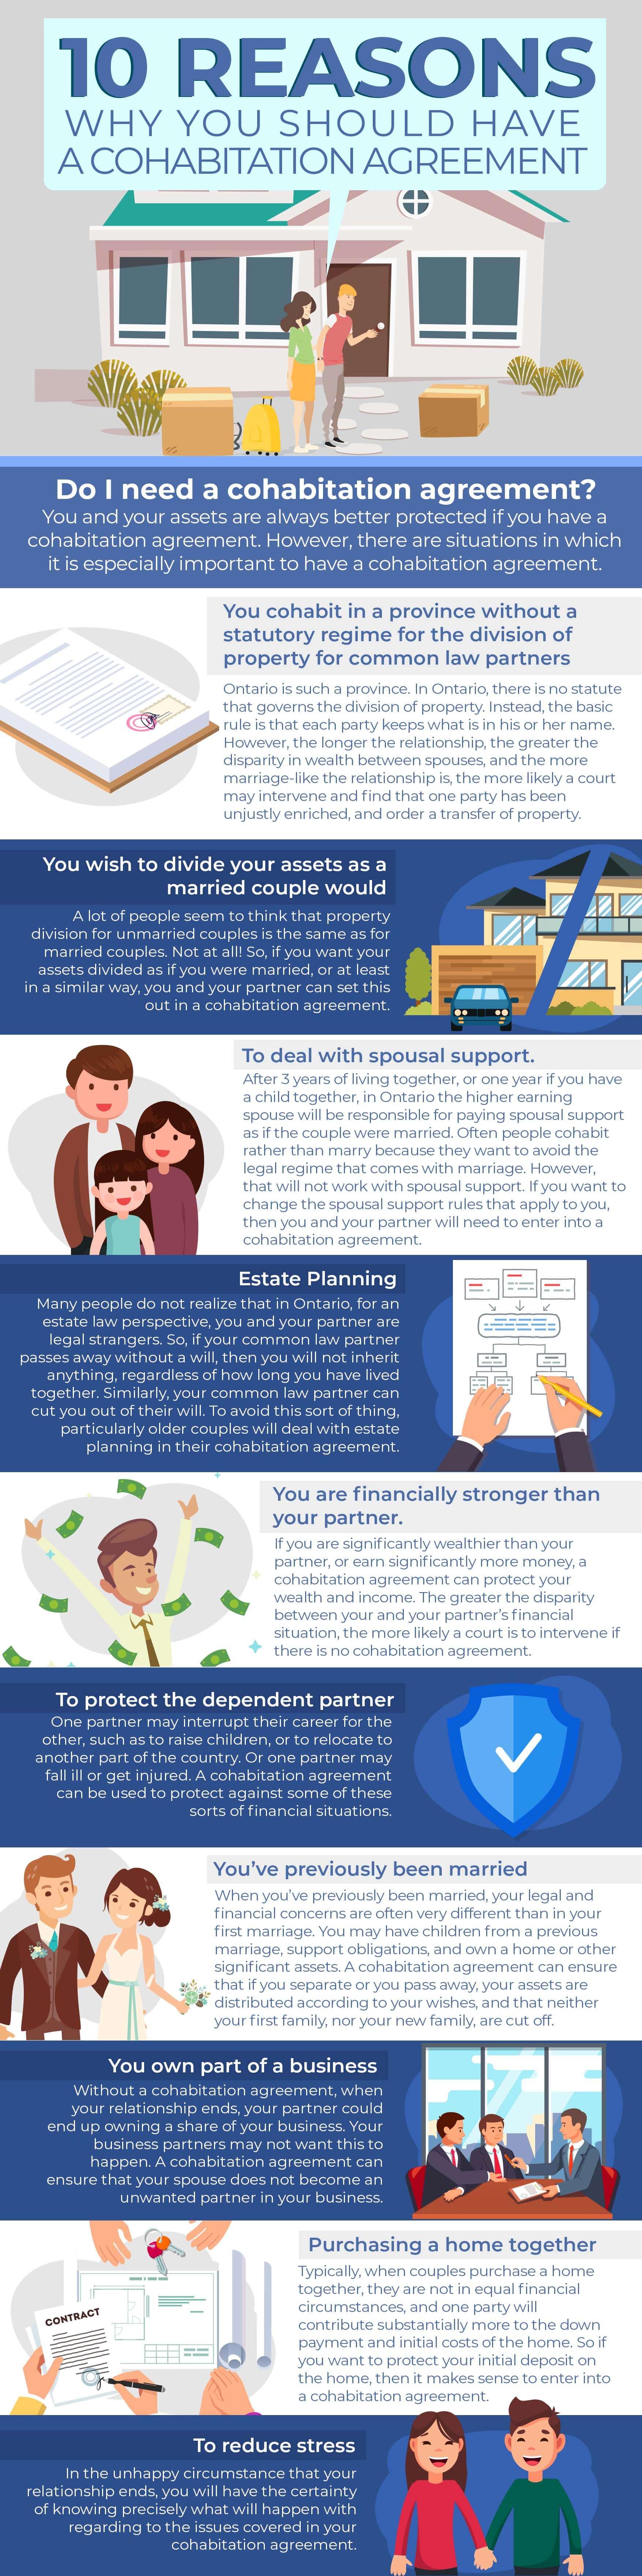 cohabitation-agreements-infographic-plaza